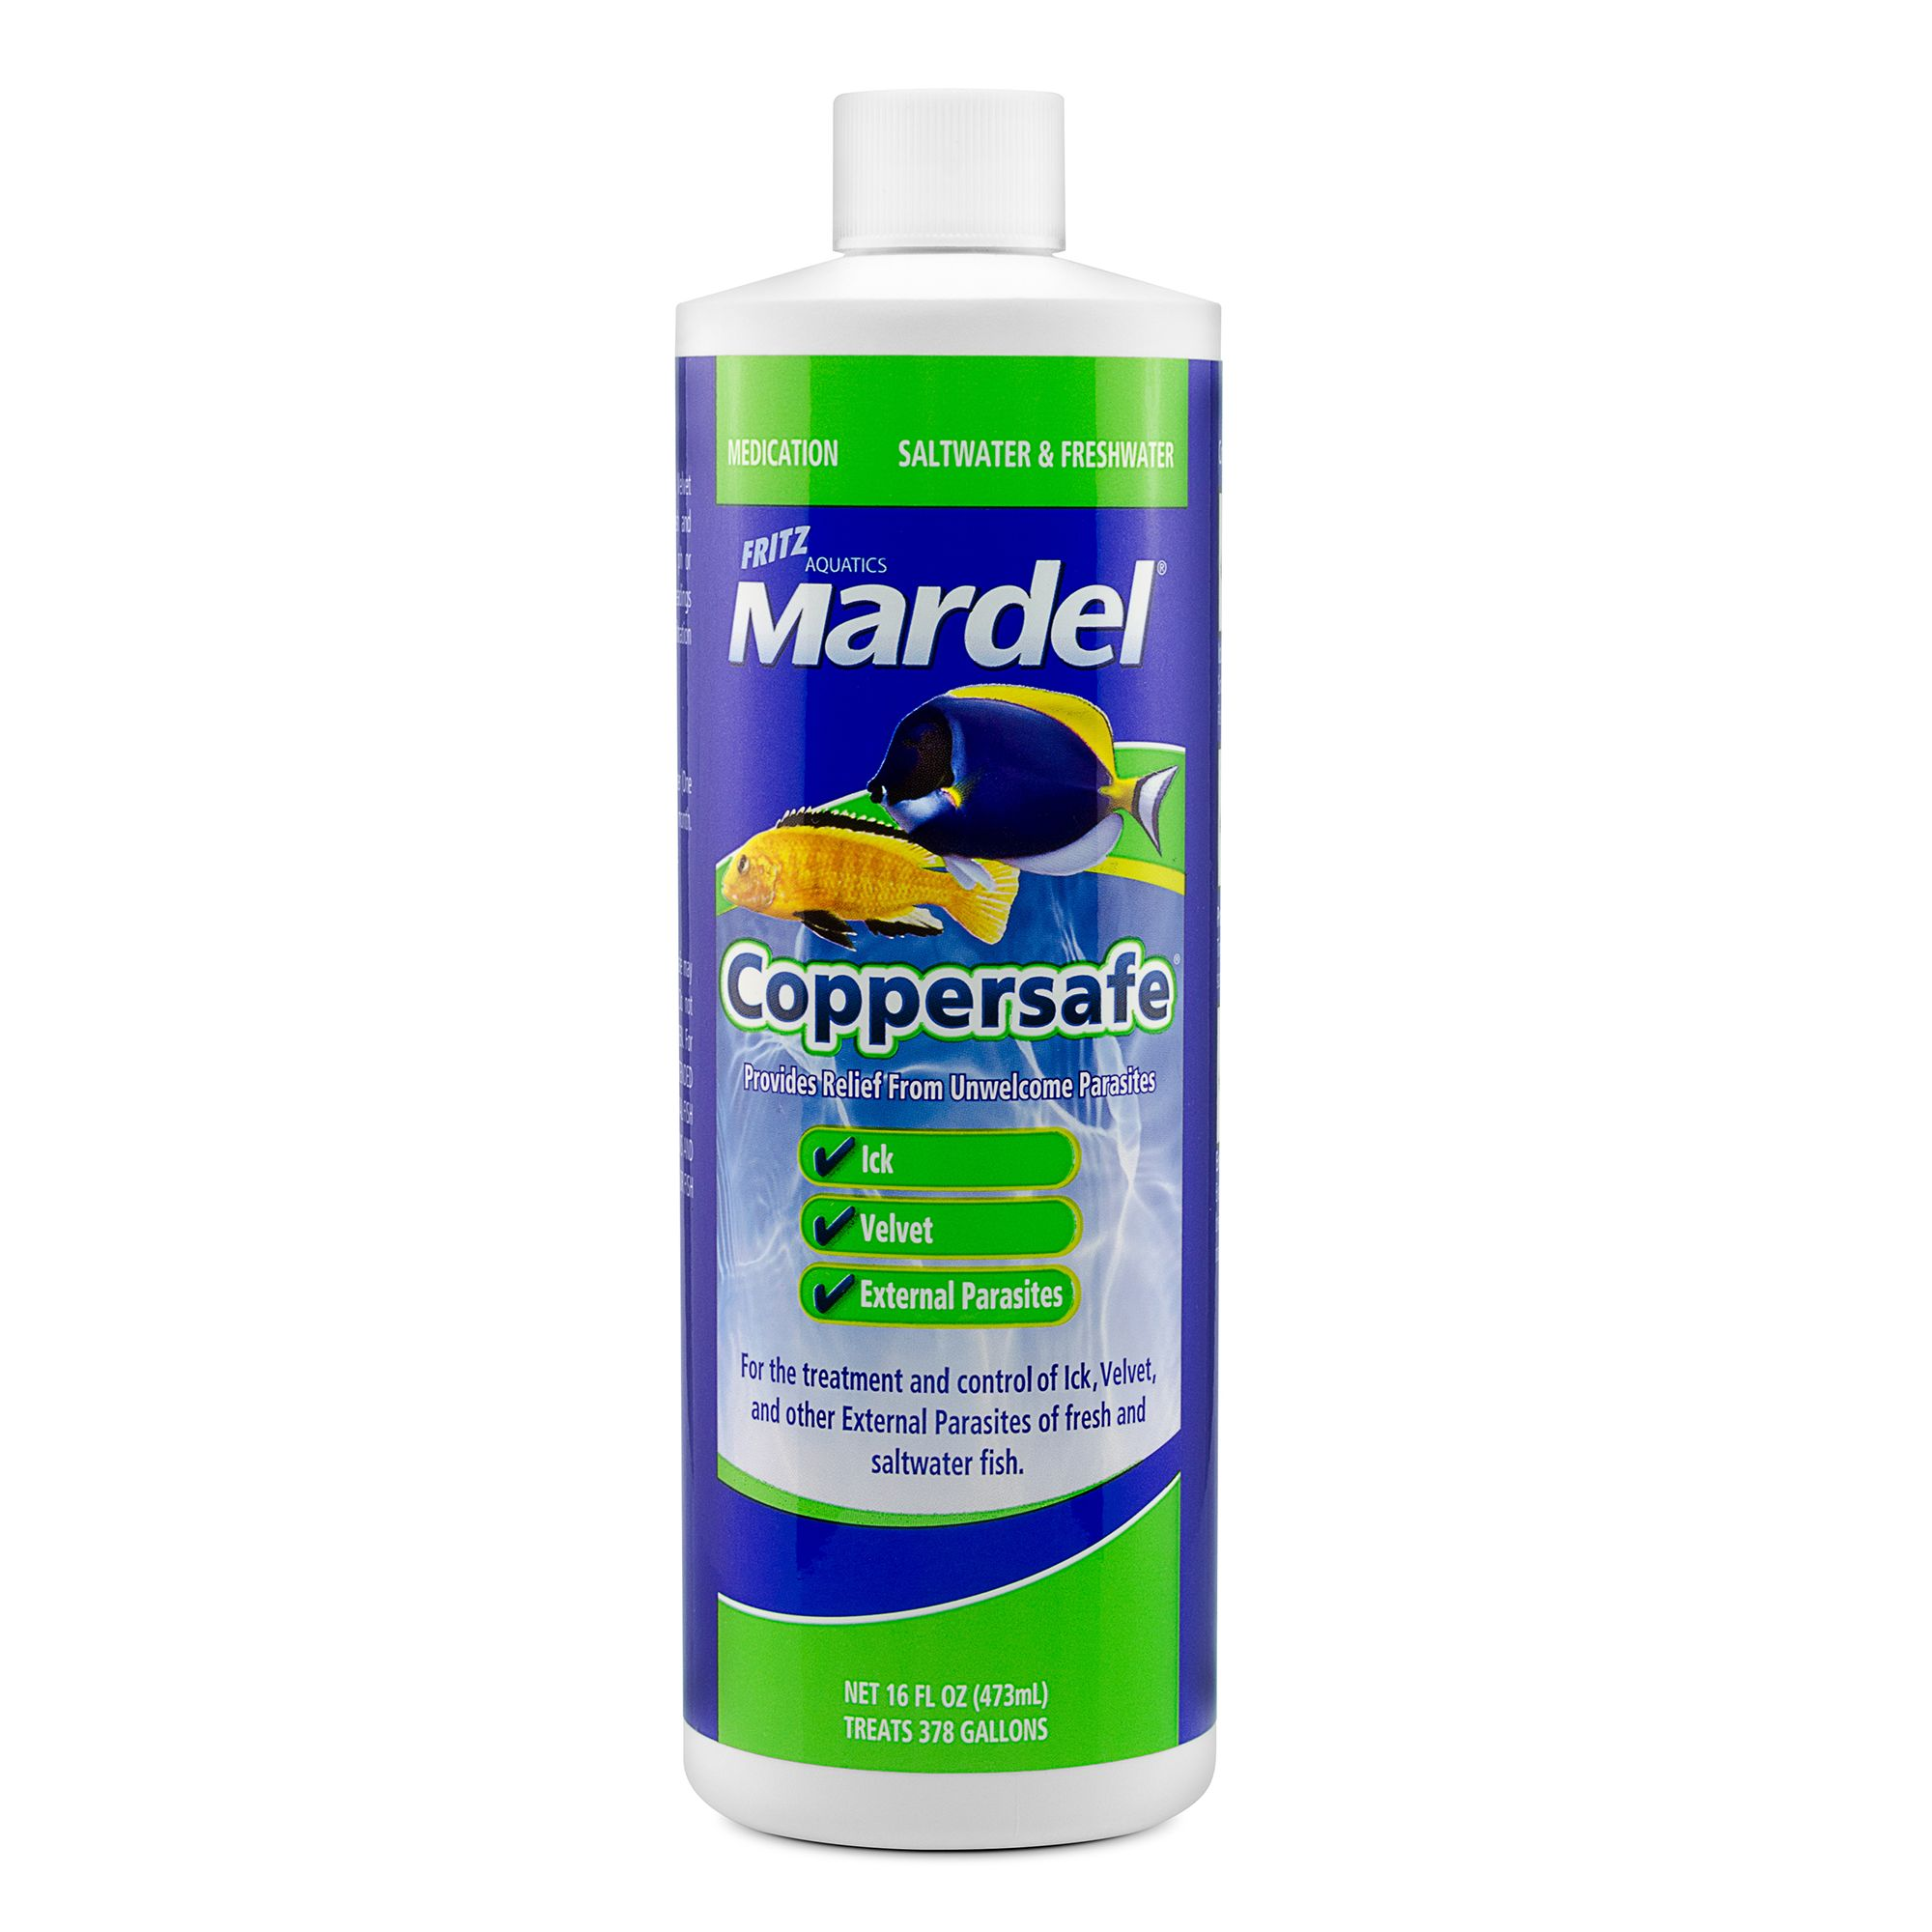 Mardel Coppersafe Disease Treatment Size 16 Fl Oz